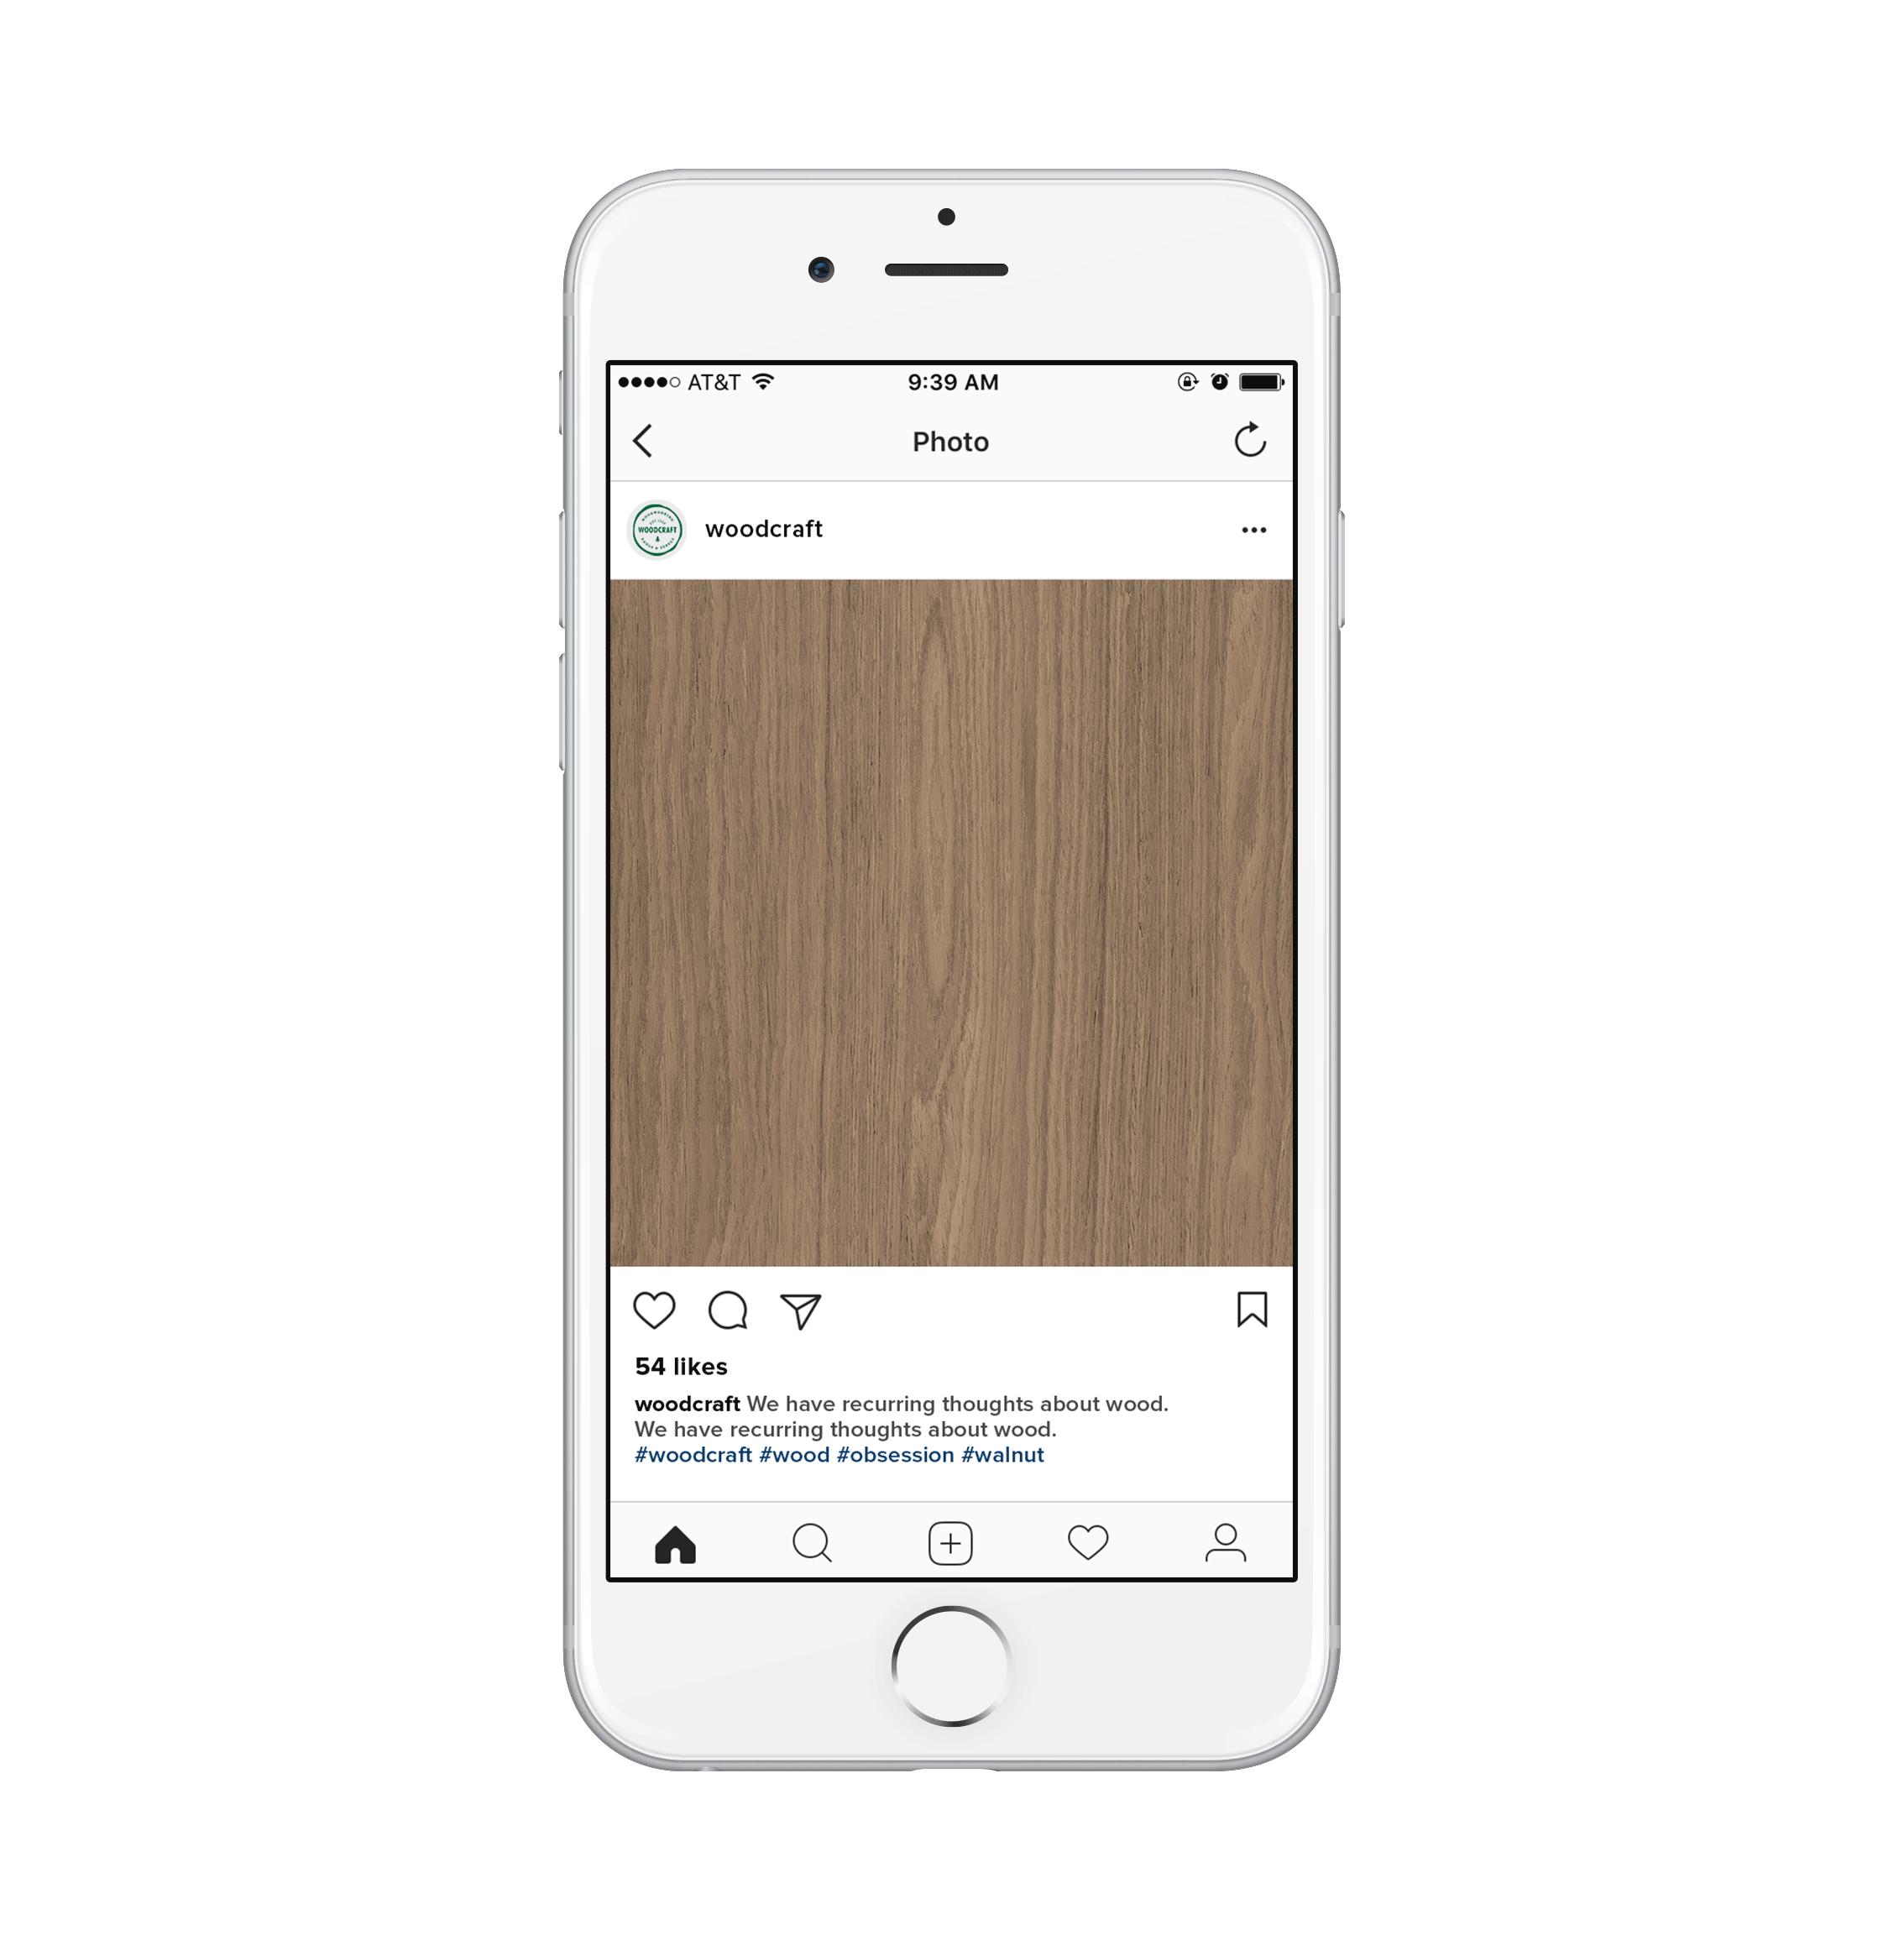 Woodcraft_Social_InstagramFeed_PostWalnut.png